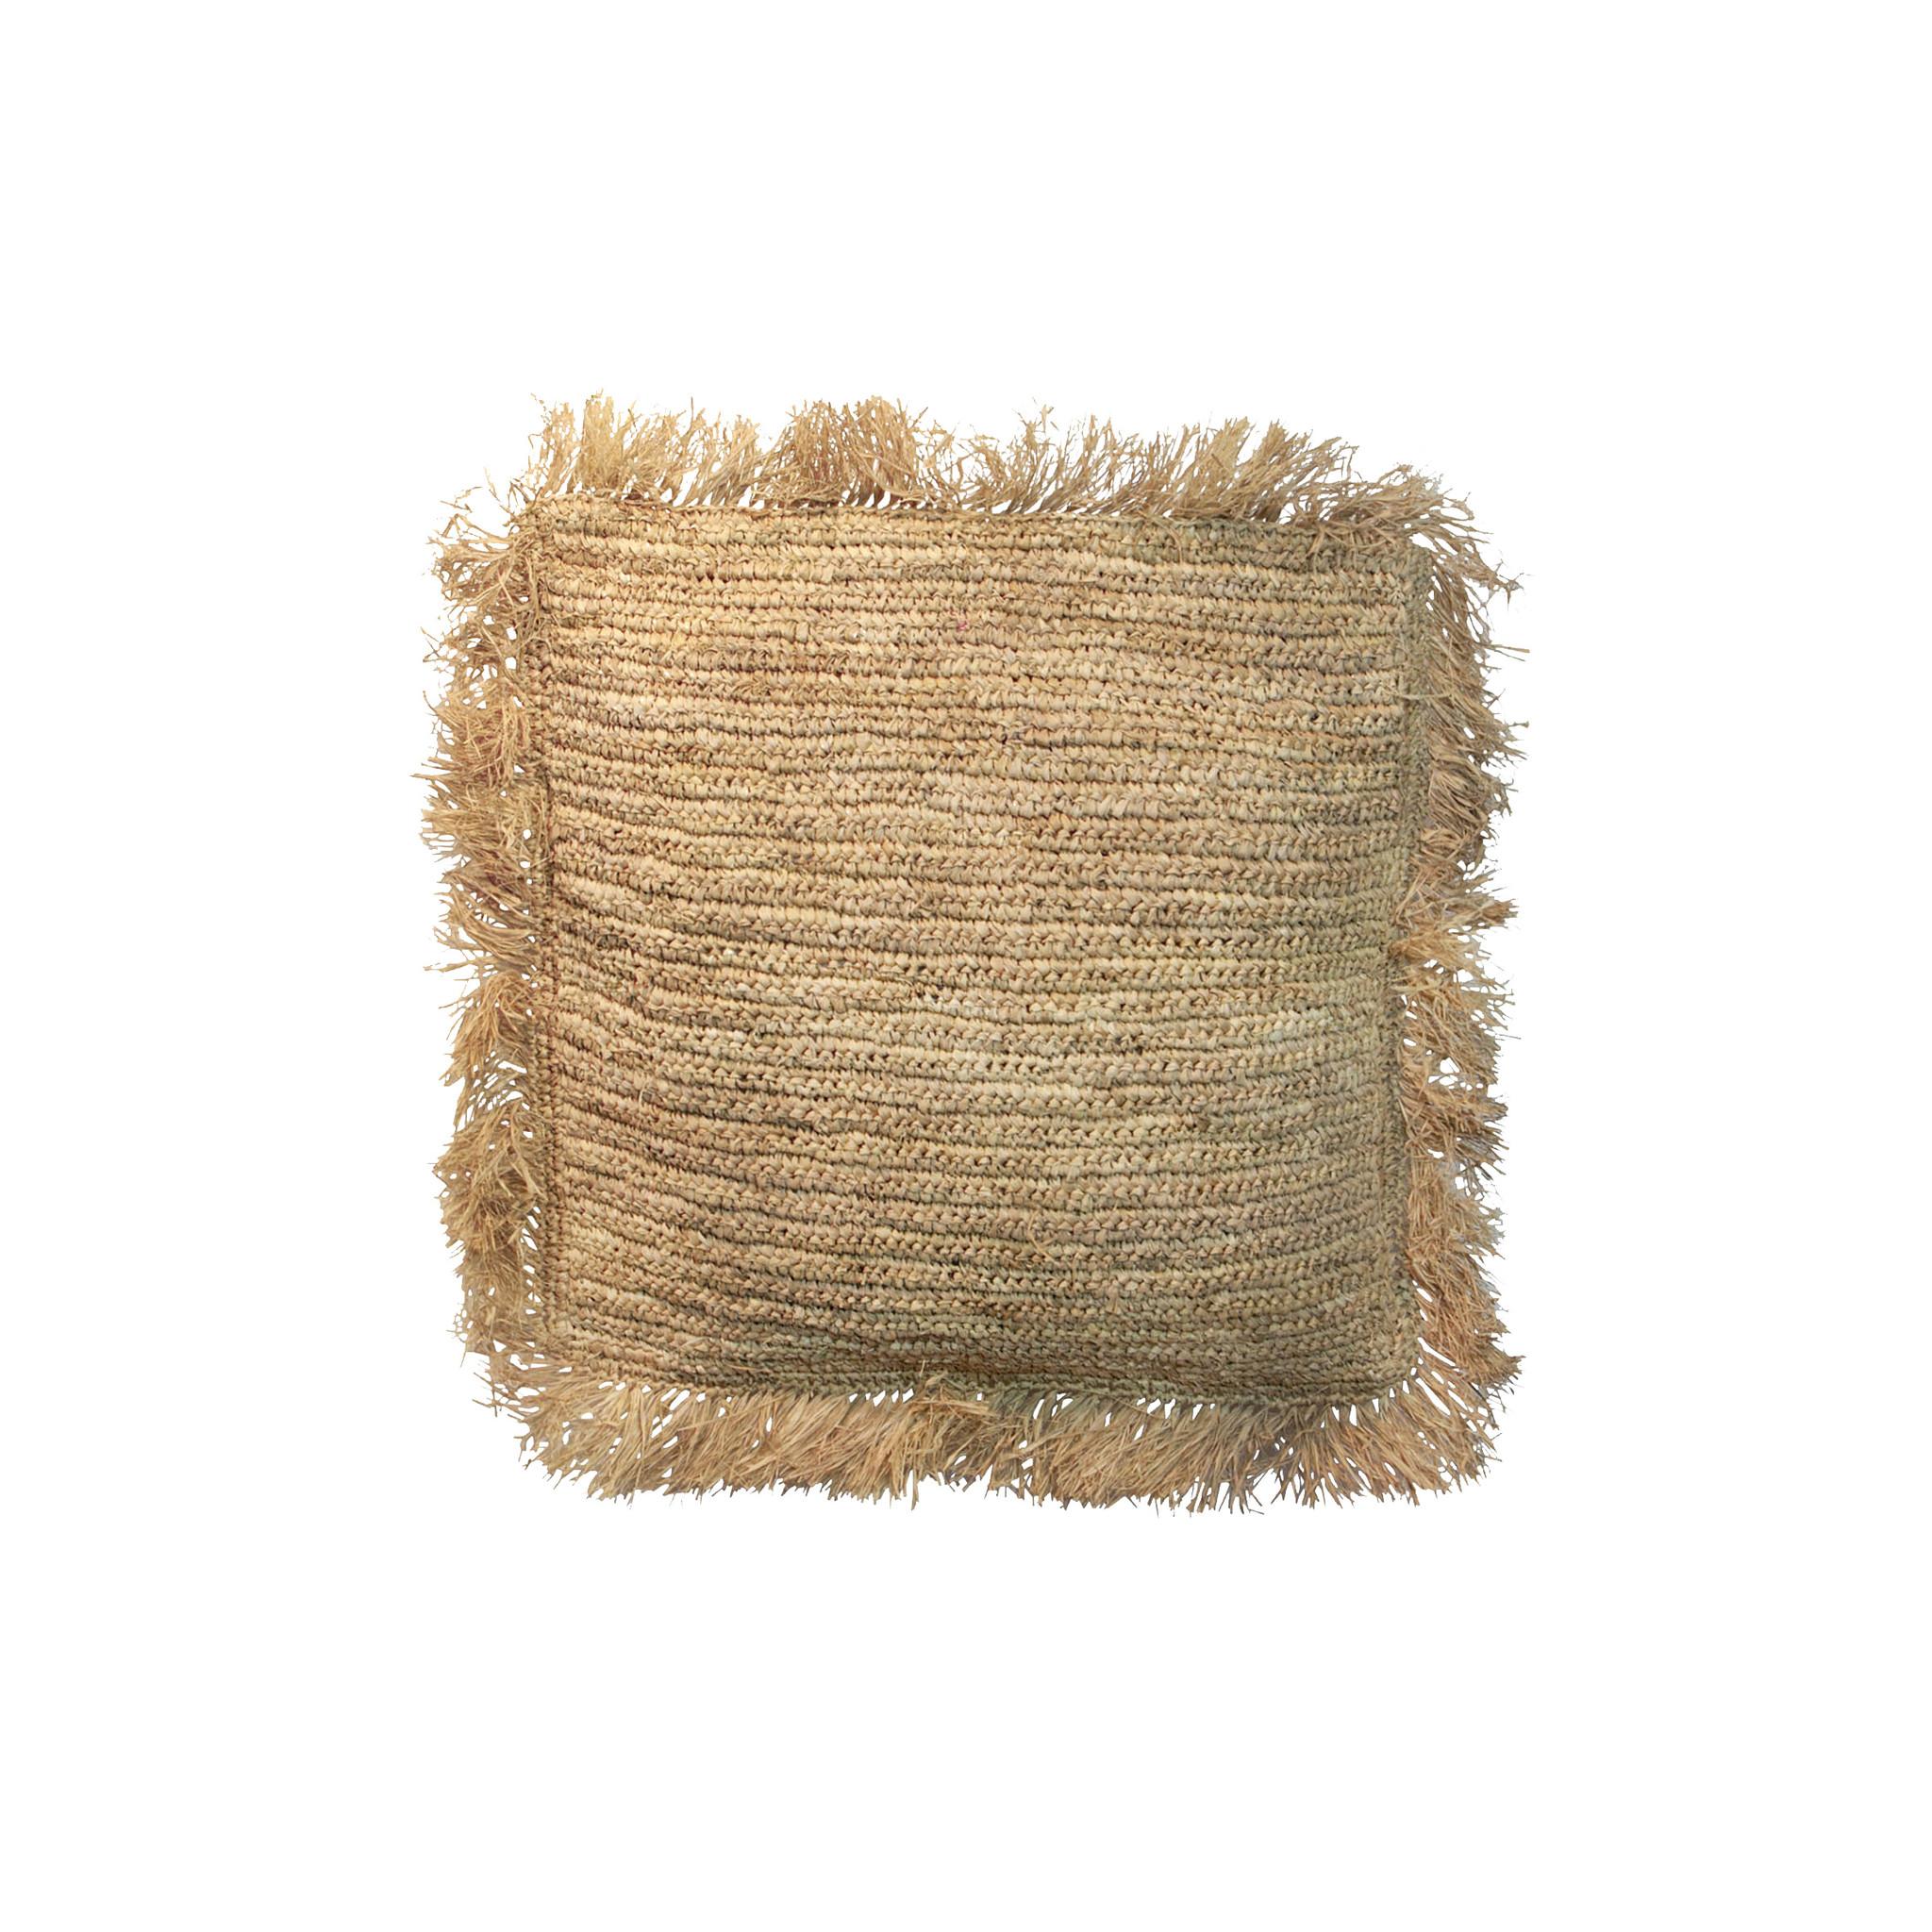 Cojín de rafia - natural - 40x40cm